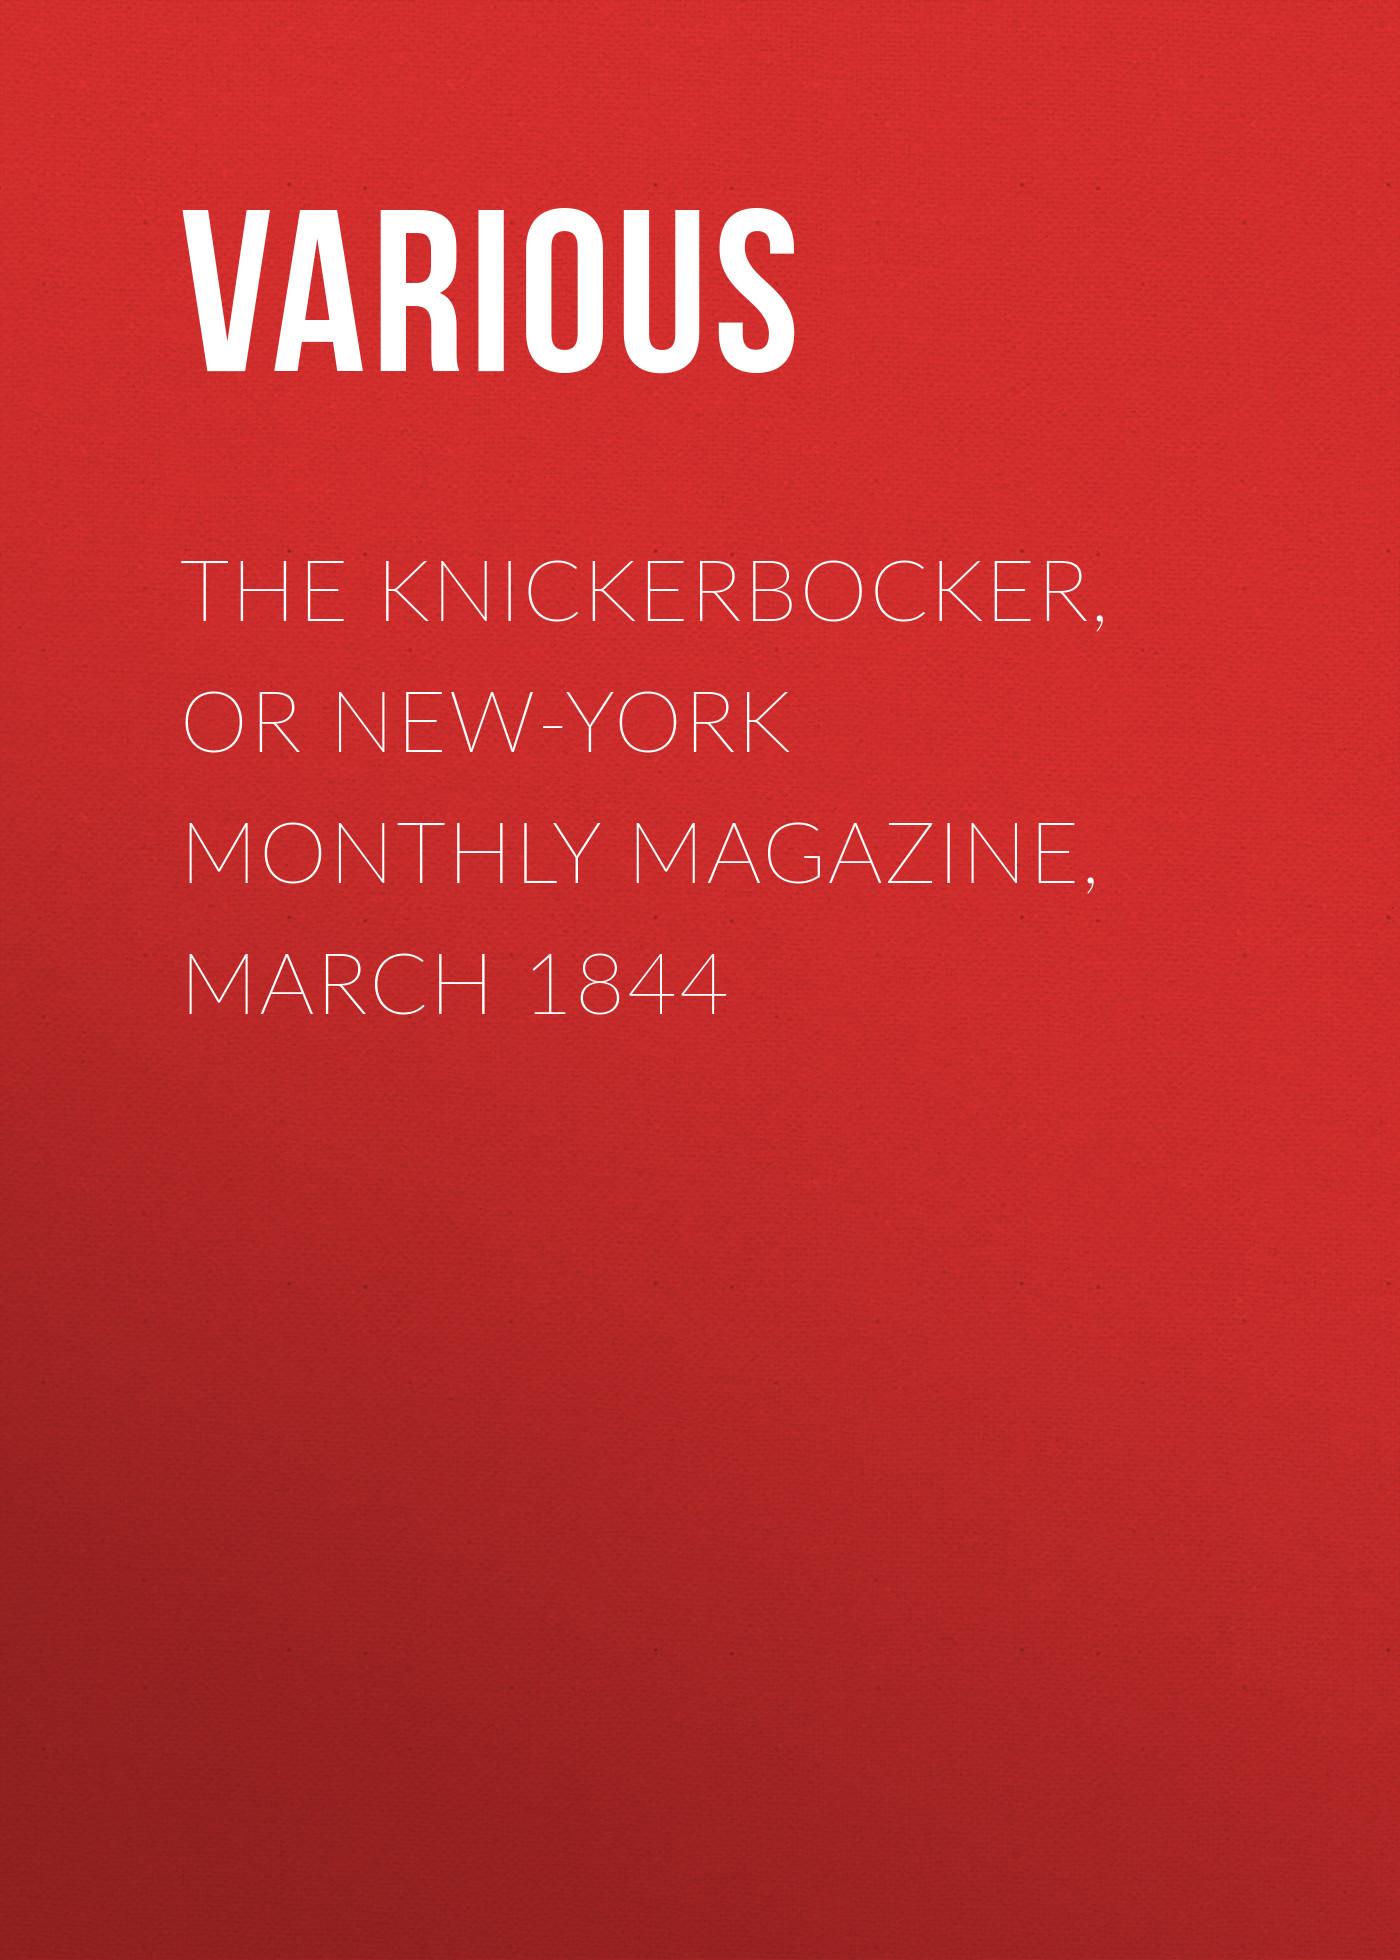 лучшая цена Various The Knickerbocker, or New-York Monthly Magazine, March 1844